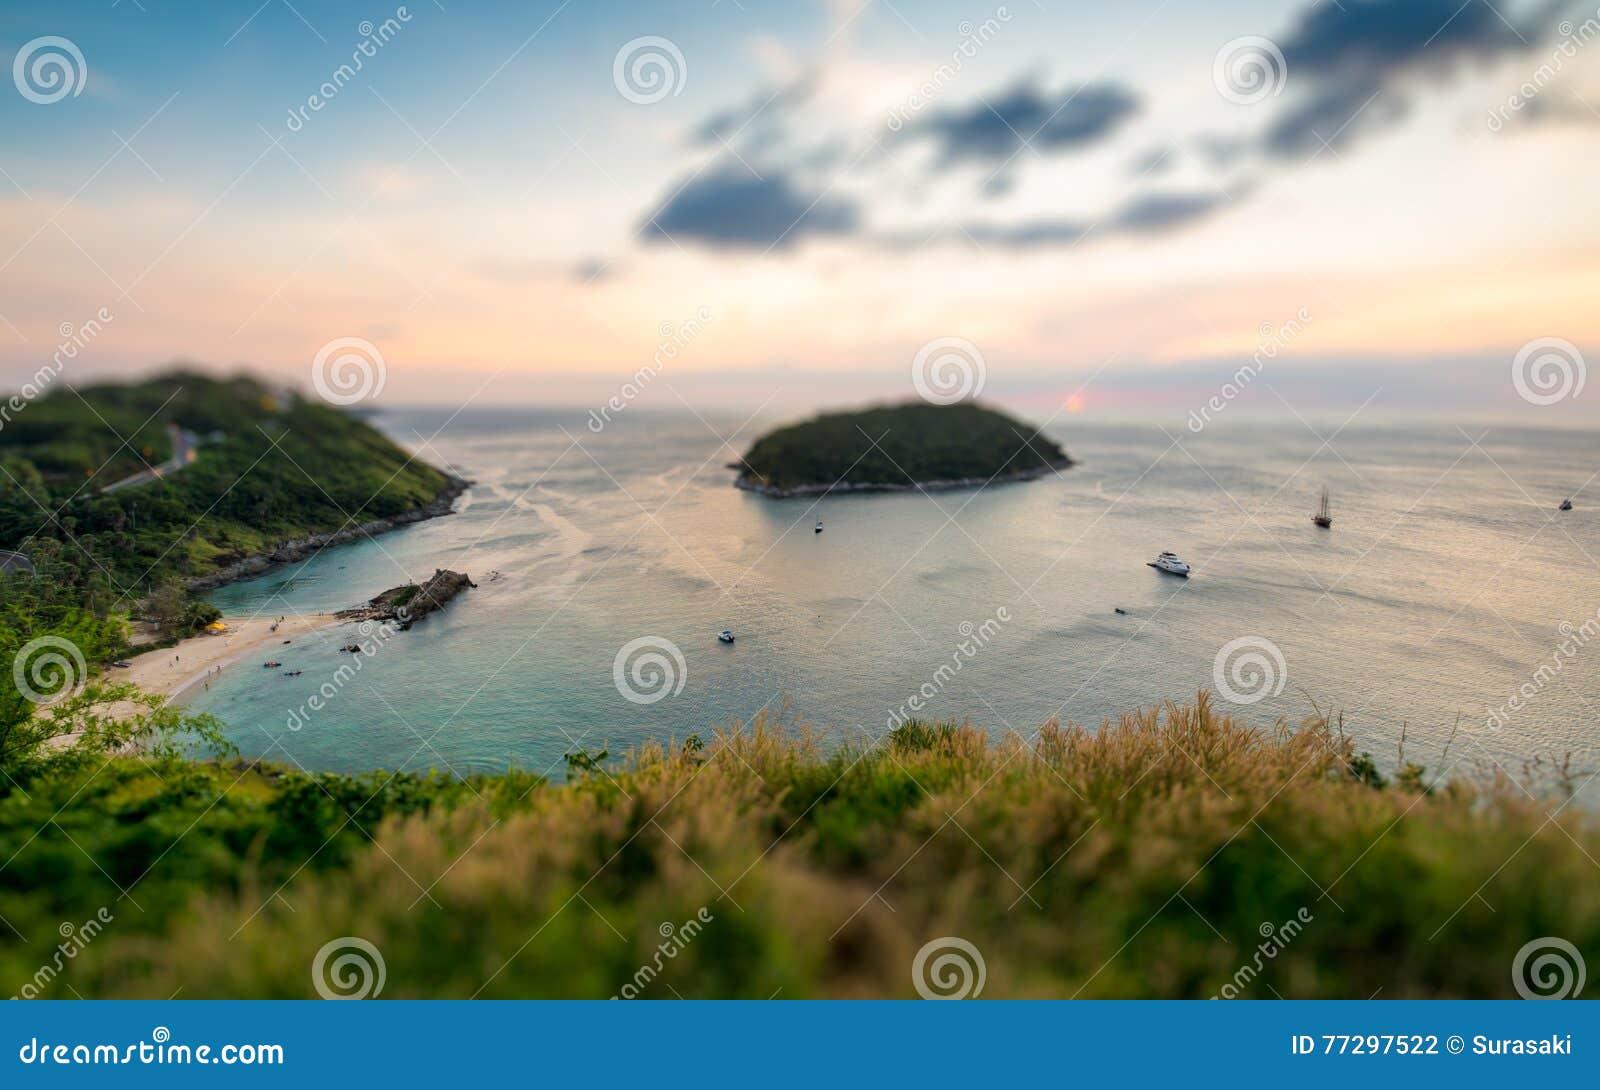 Tilt shift of tropical ocean landscape with a little island